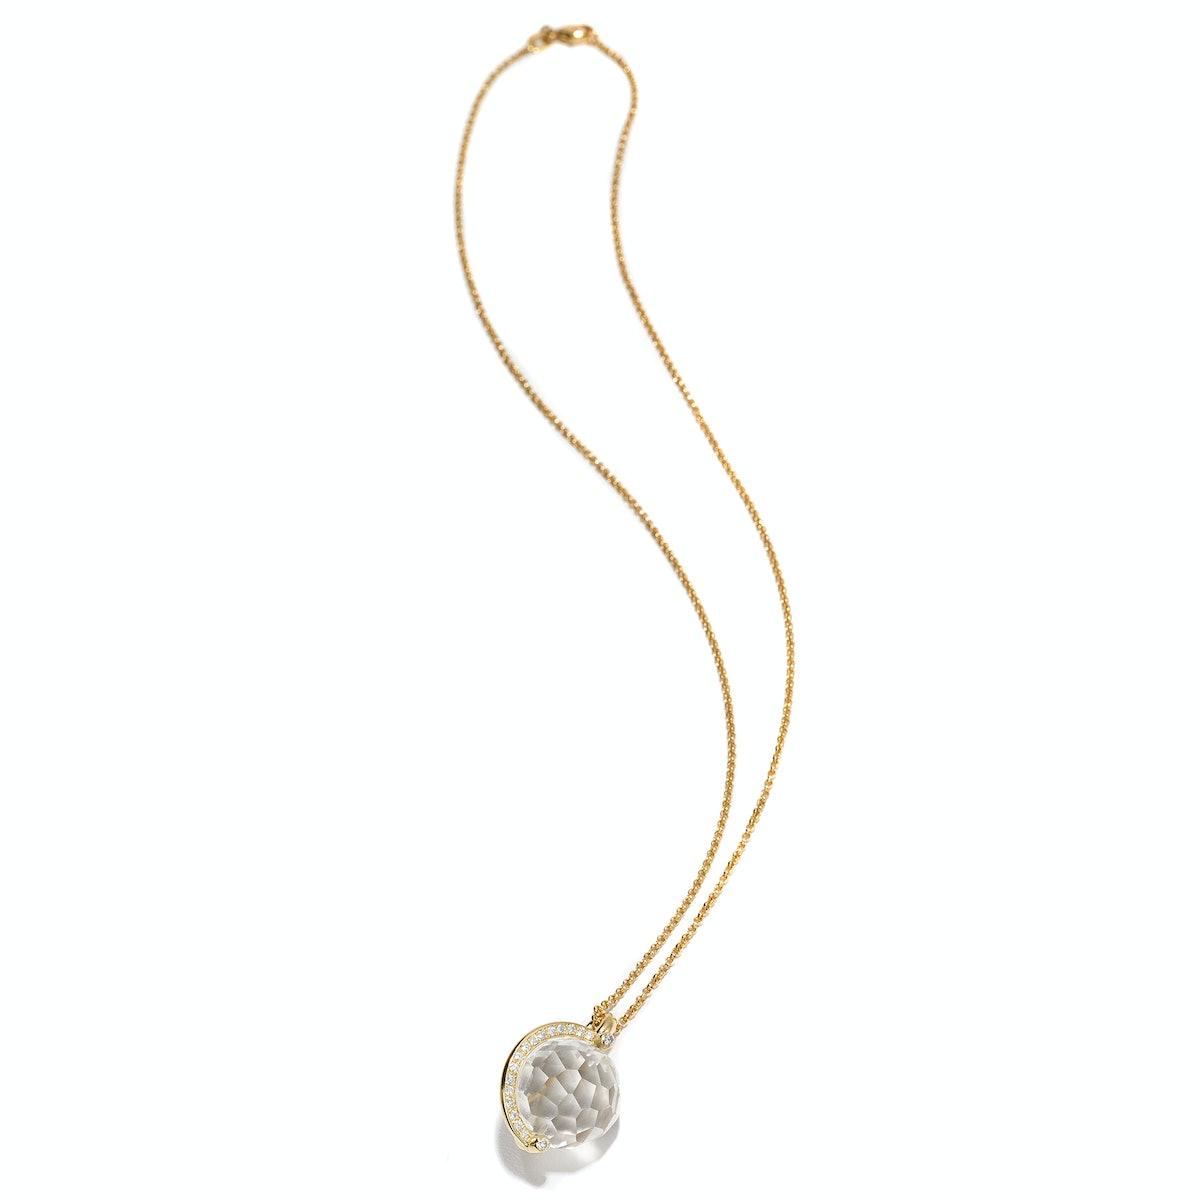 Yael Sonia gold, quartz, and diamond necklace